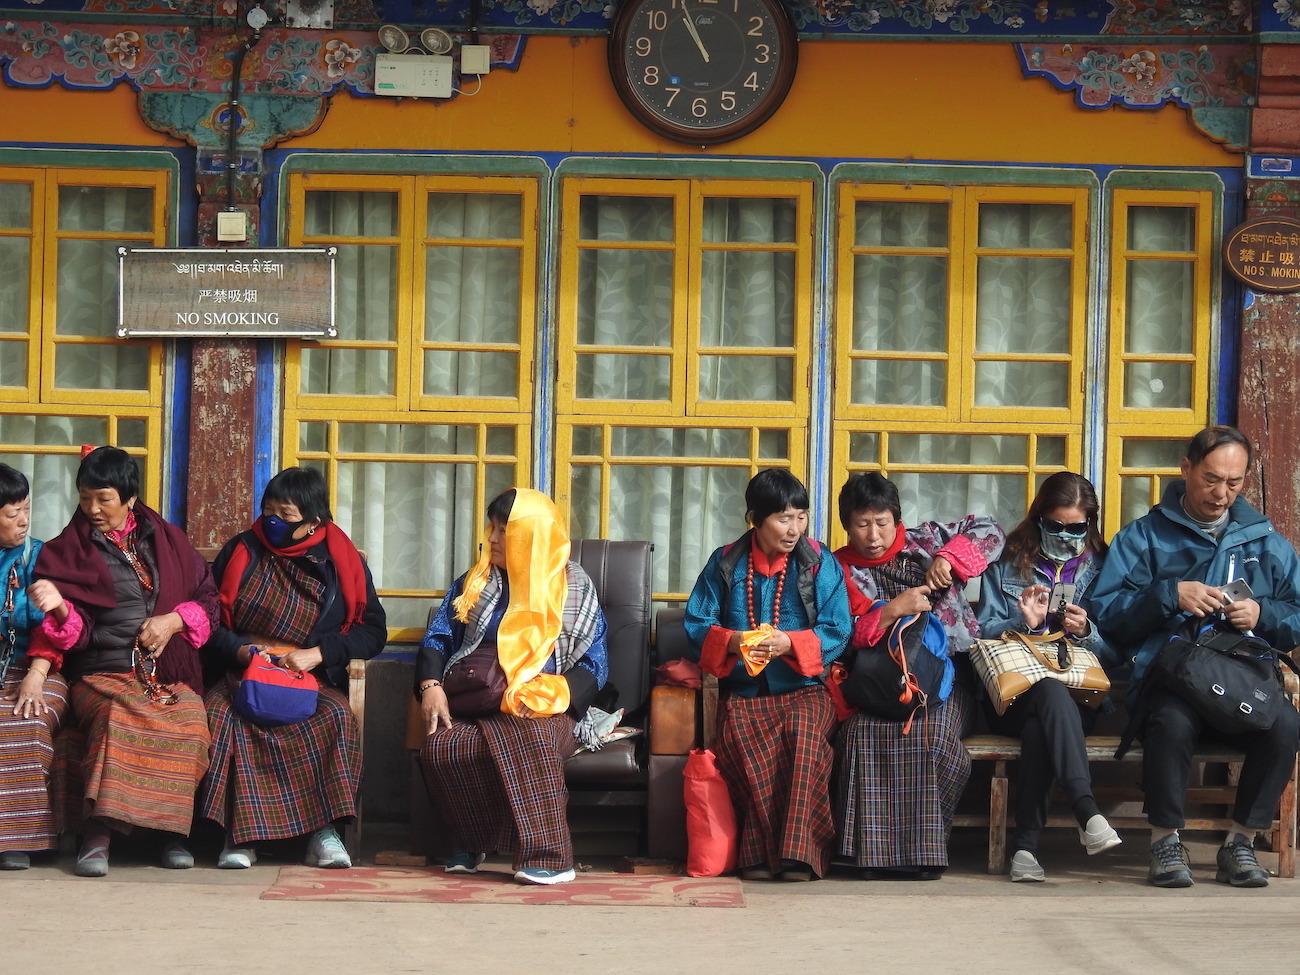 Armchair Traveller: Barkhor Square, Lhasa, Tibet – Still ...